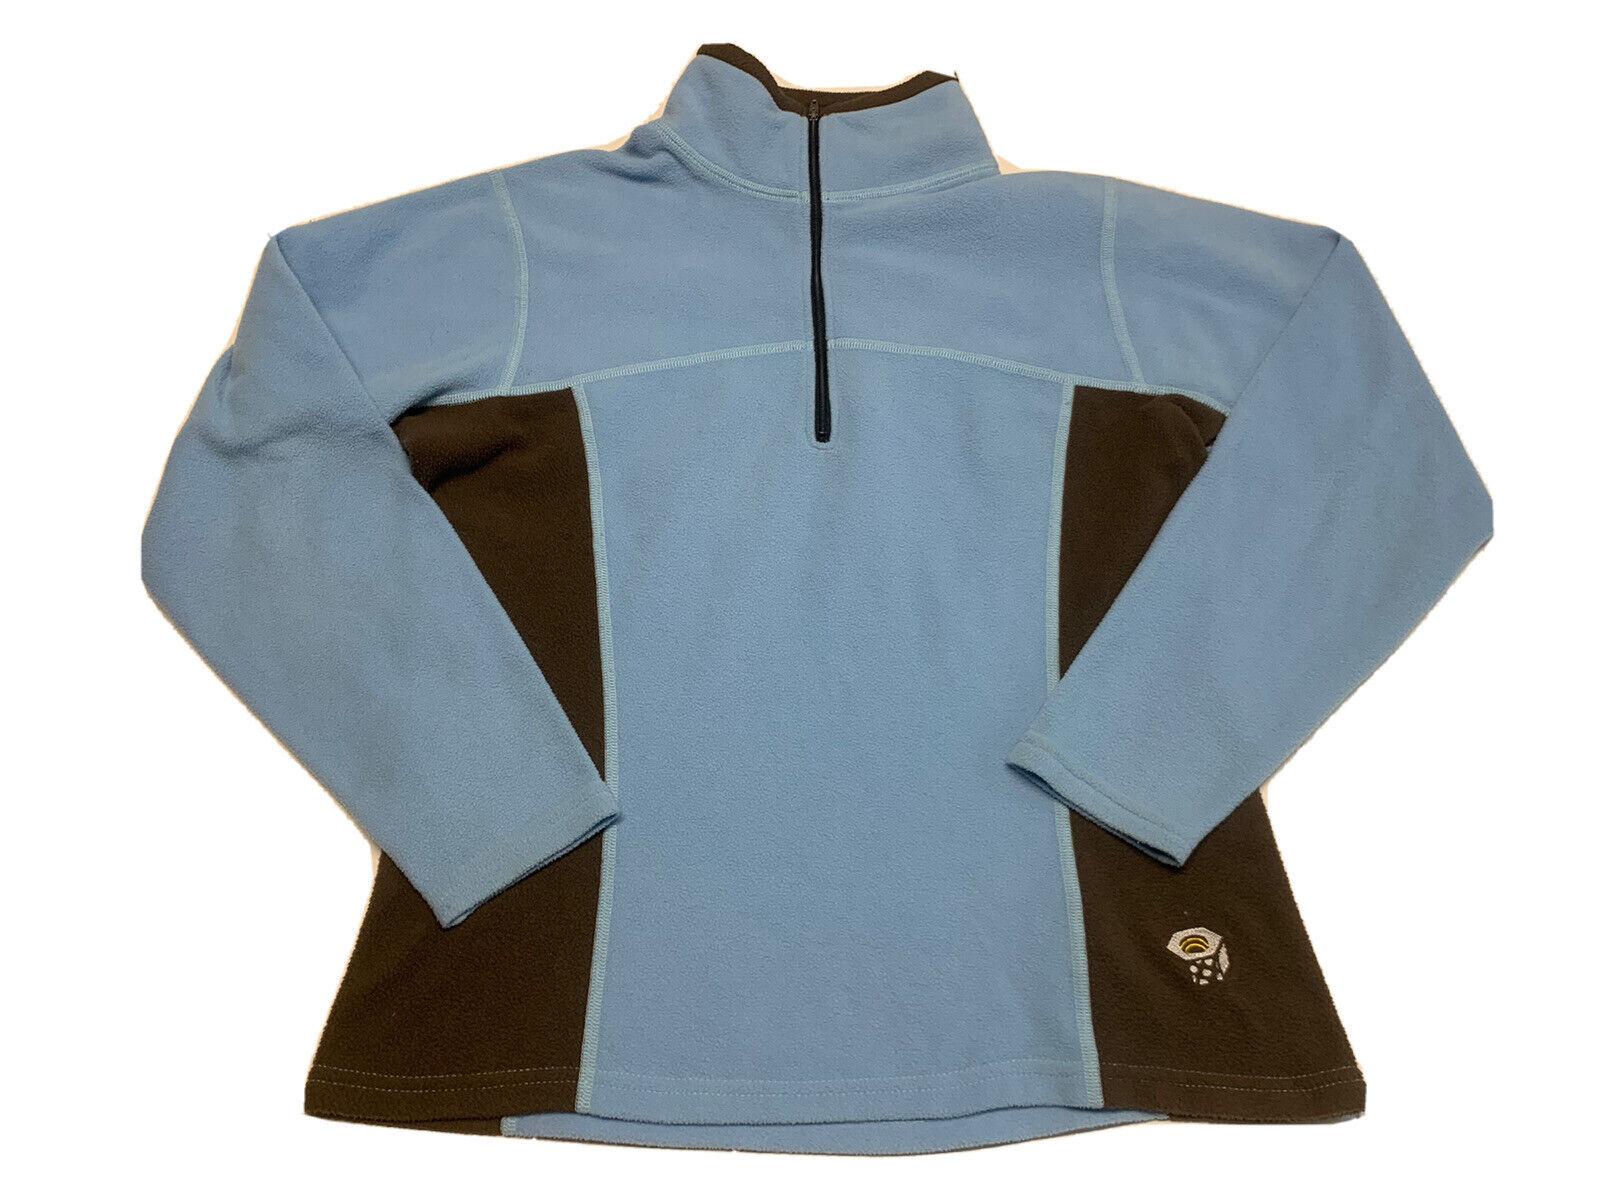 Mountain Hardware Womens Size 8 Polartec Fleece Pullover Blue 1/4 Zip Jacket